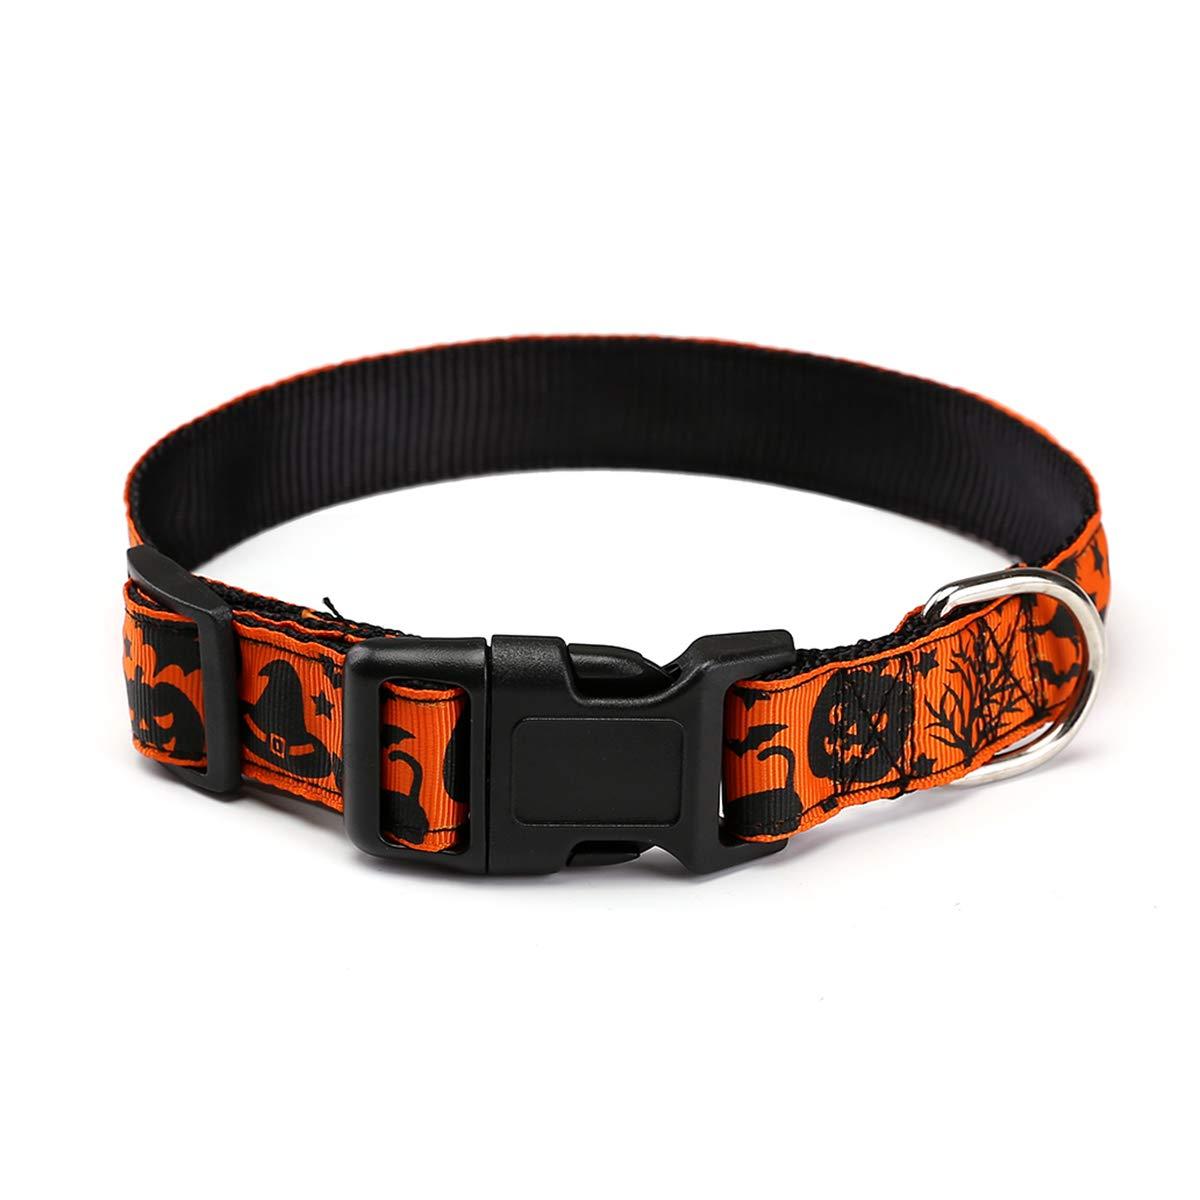 Dark orange M Dark orange M Adorrable Dog Collar for Halloween Adjustable Collar Cover for Pet Collars with Decoration,Dark orange,Neck 15.7 -19.7 ,45lb